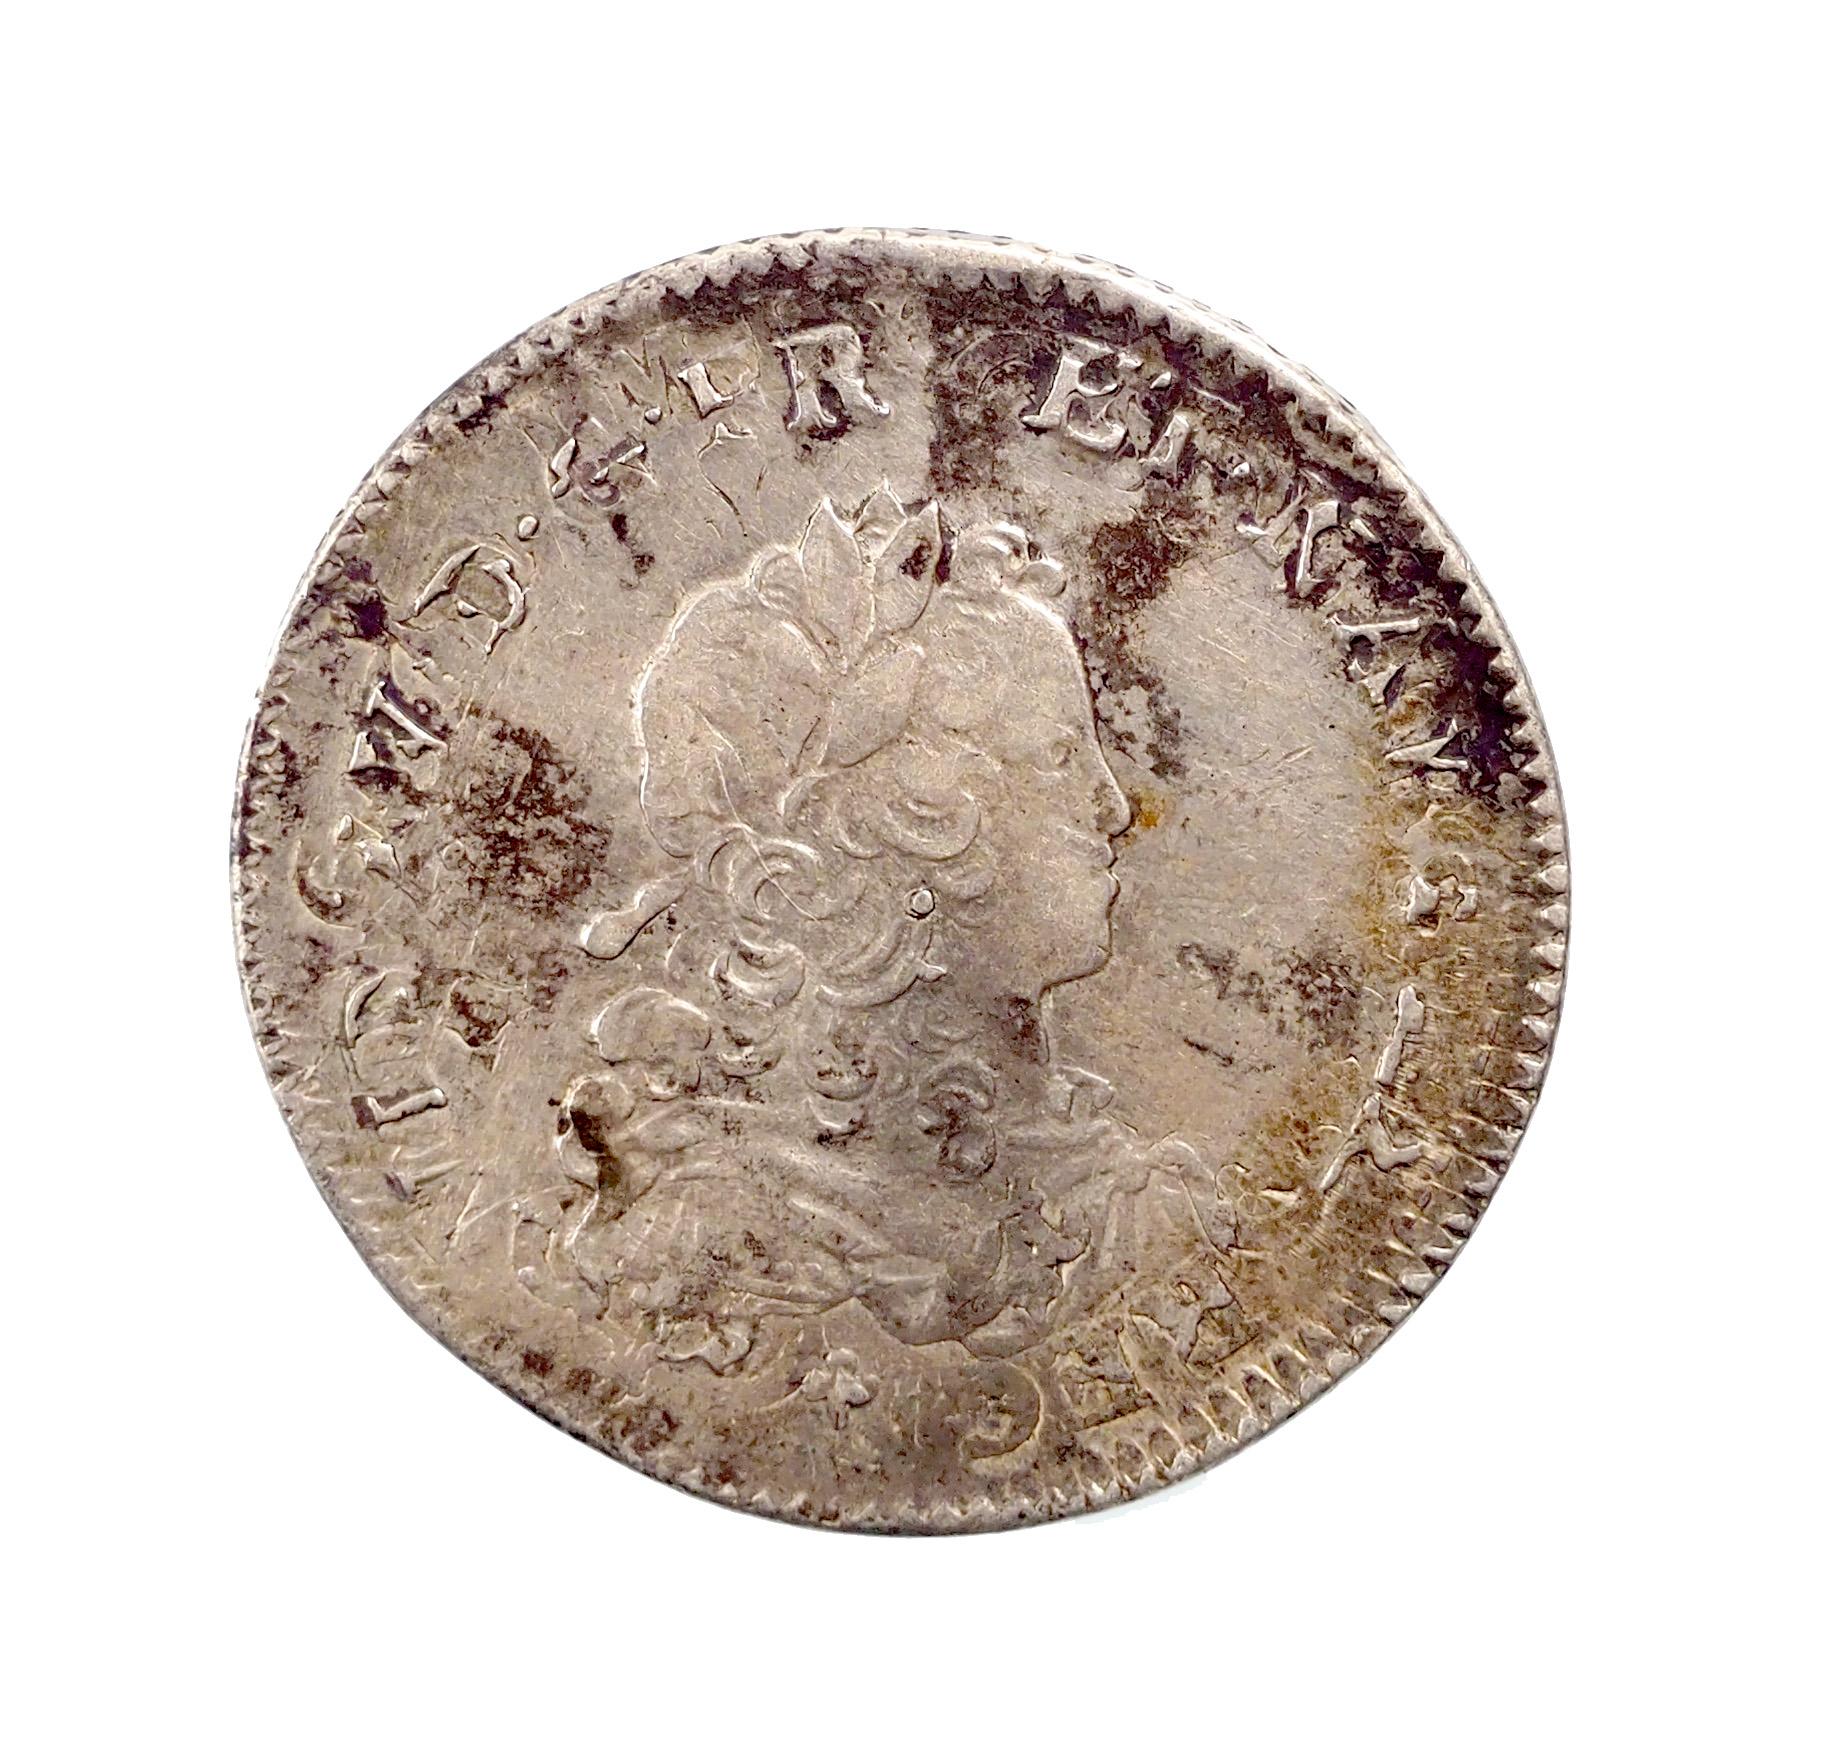 France, Louis XV, 1/3 écu 1721 W Lille, XF, Gadoury 306